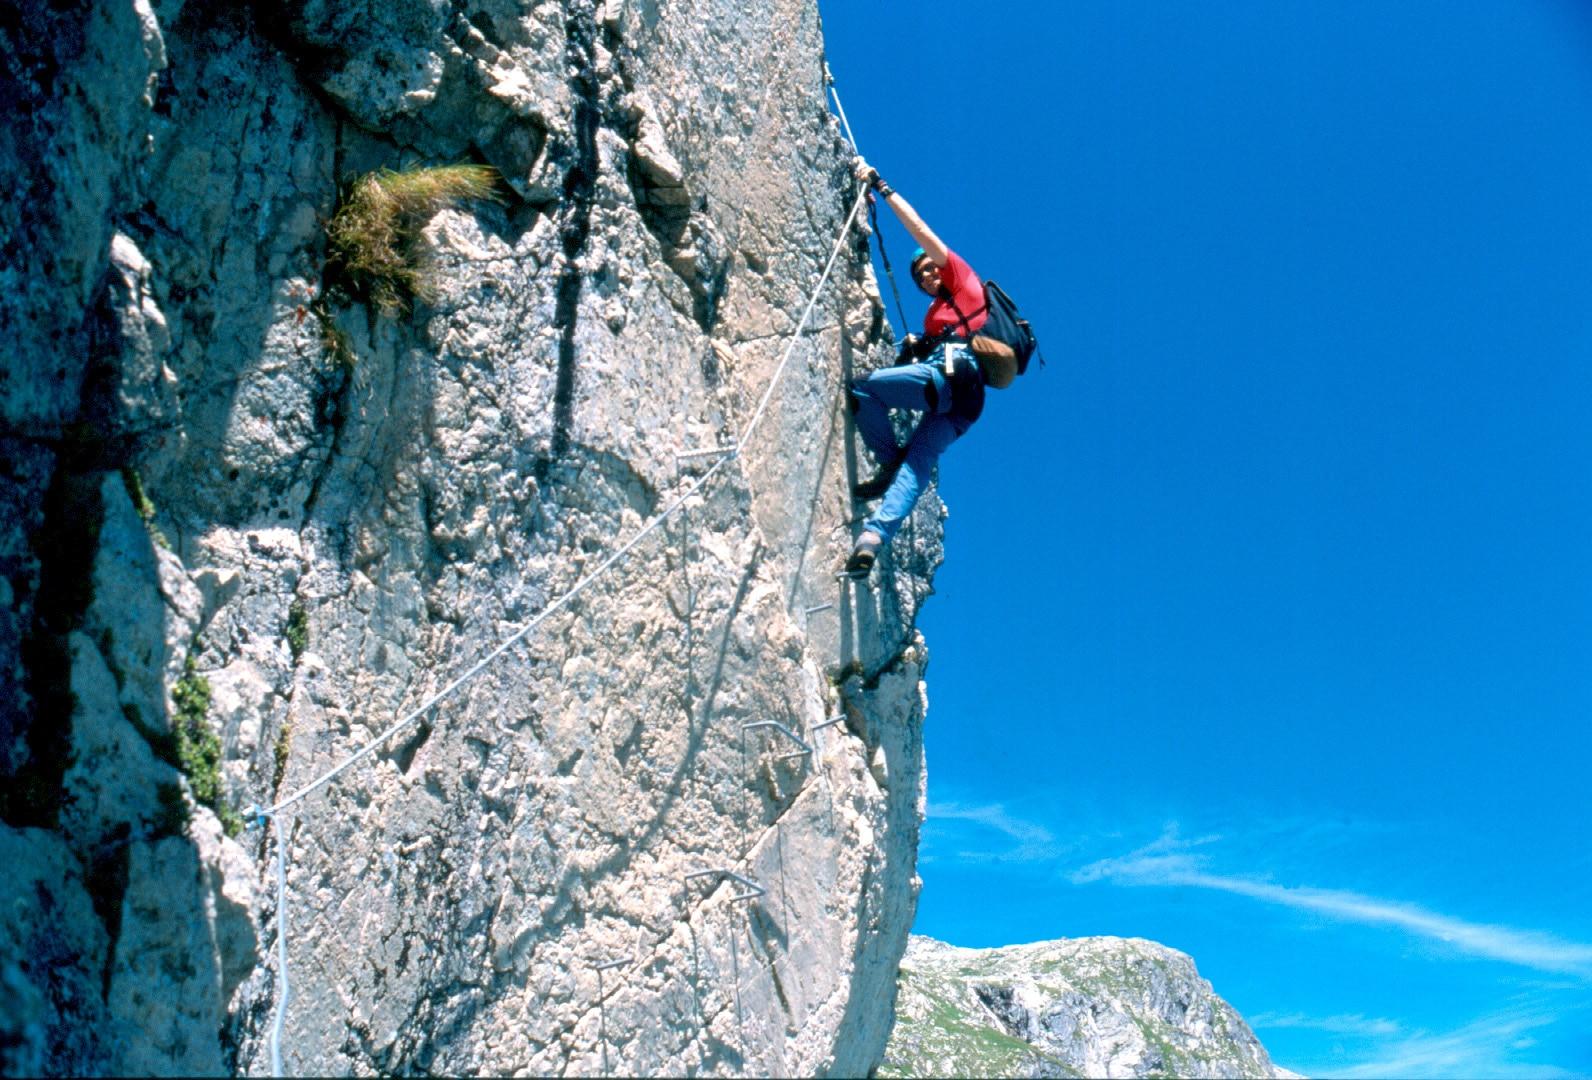 Klettersteig Fall : Protection on a klettersteig via ferrata u mountaineering